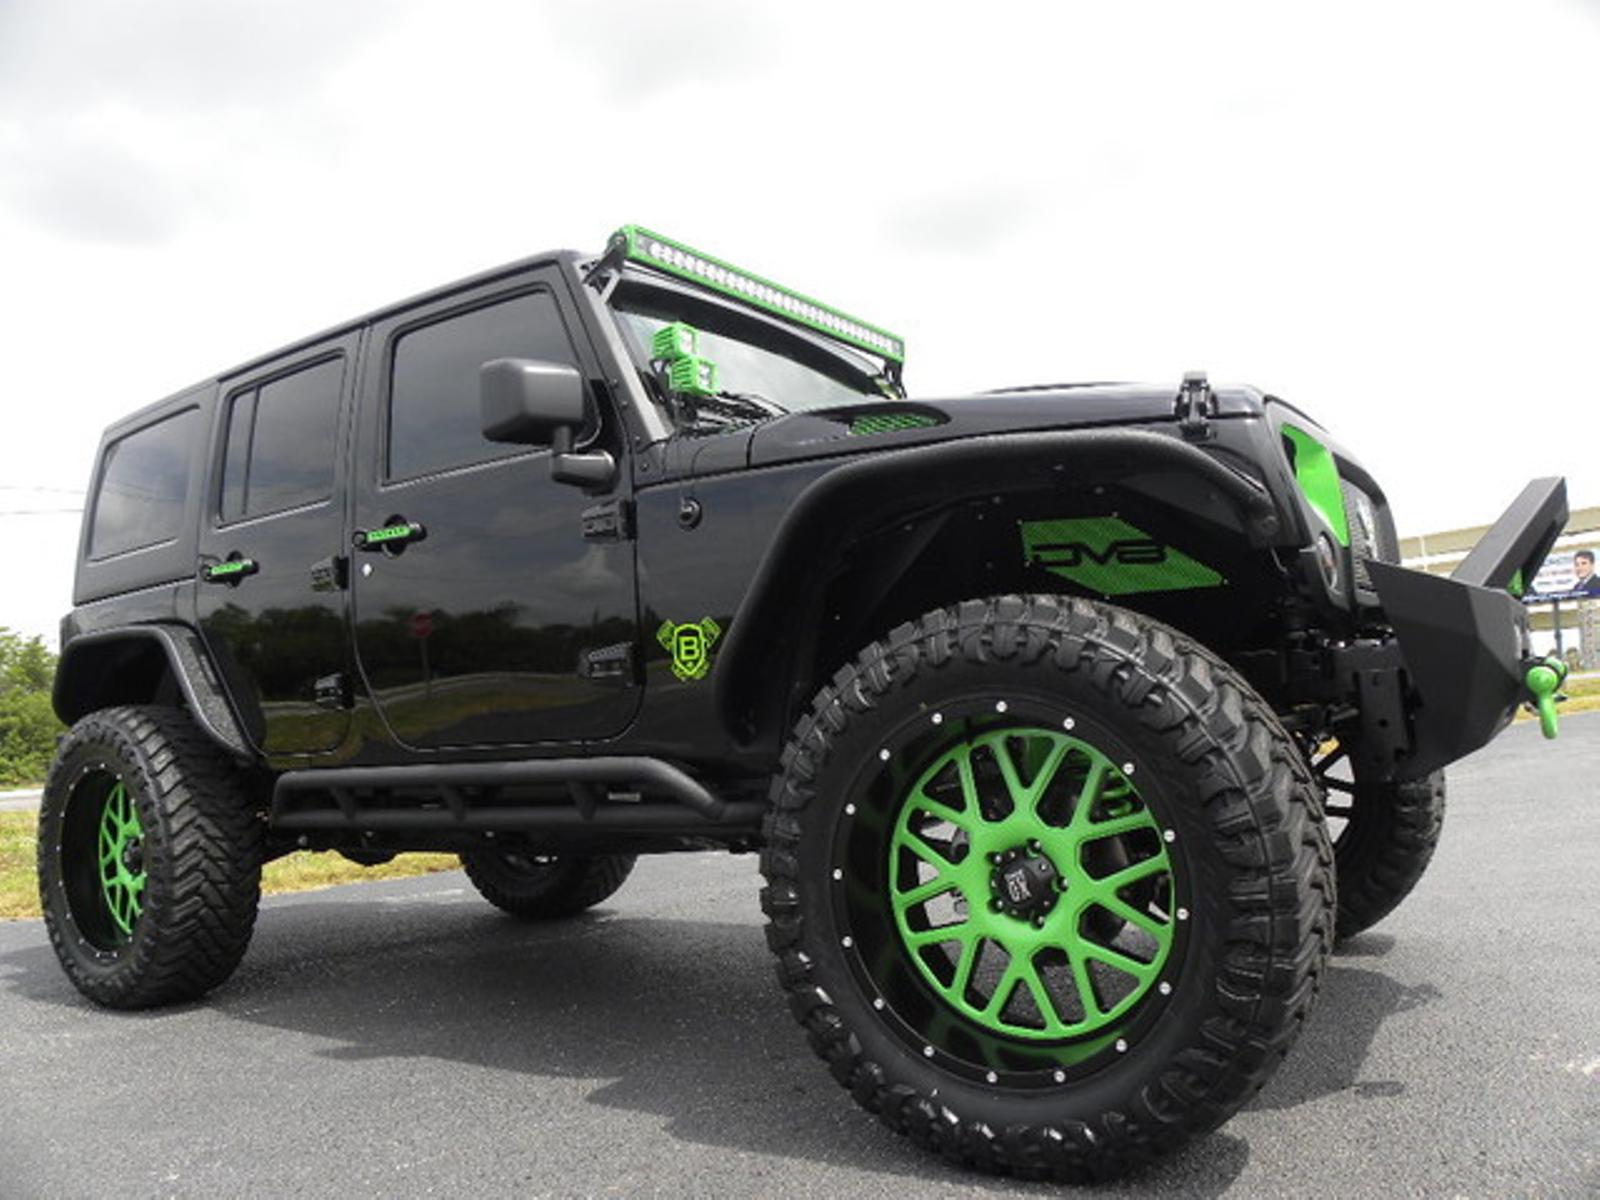 2016 jeep wrangler unlimited biohazard custom lifted leather xd dv8 florida bayshore automotive. Black Bedroom Furniture Sets. Home Design Ideas